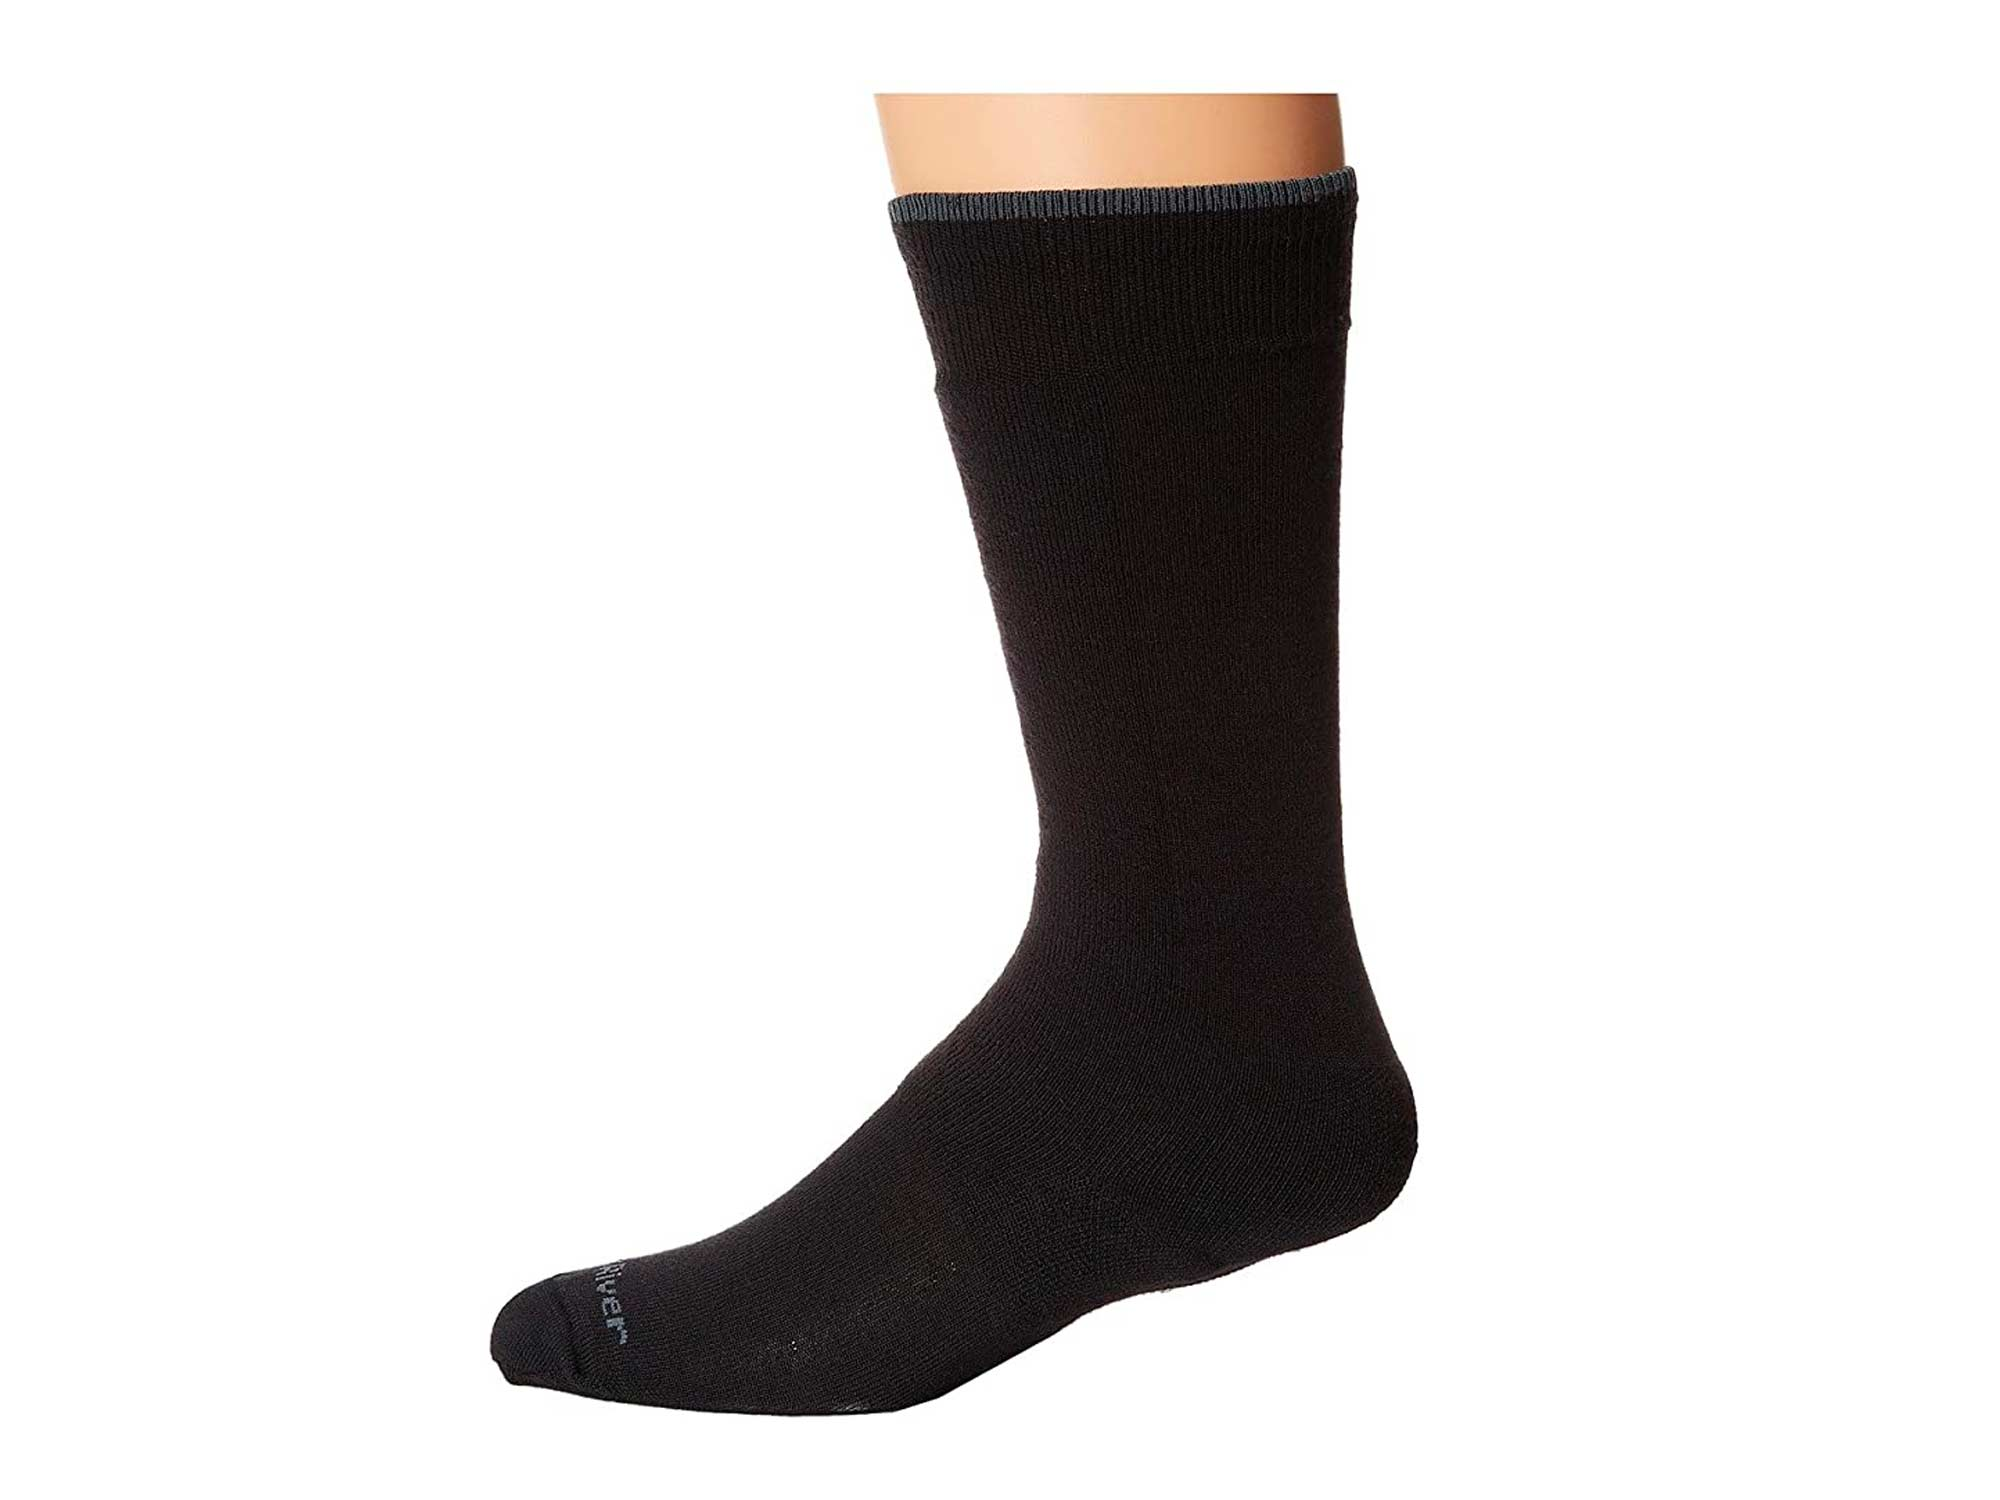 Fox River Telluride Over The Calf Socks